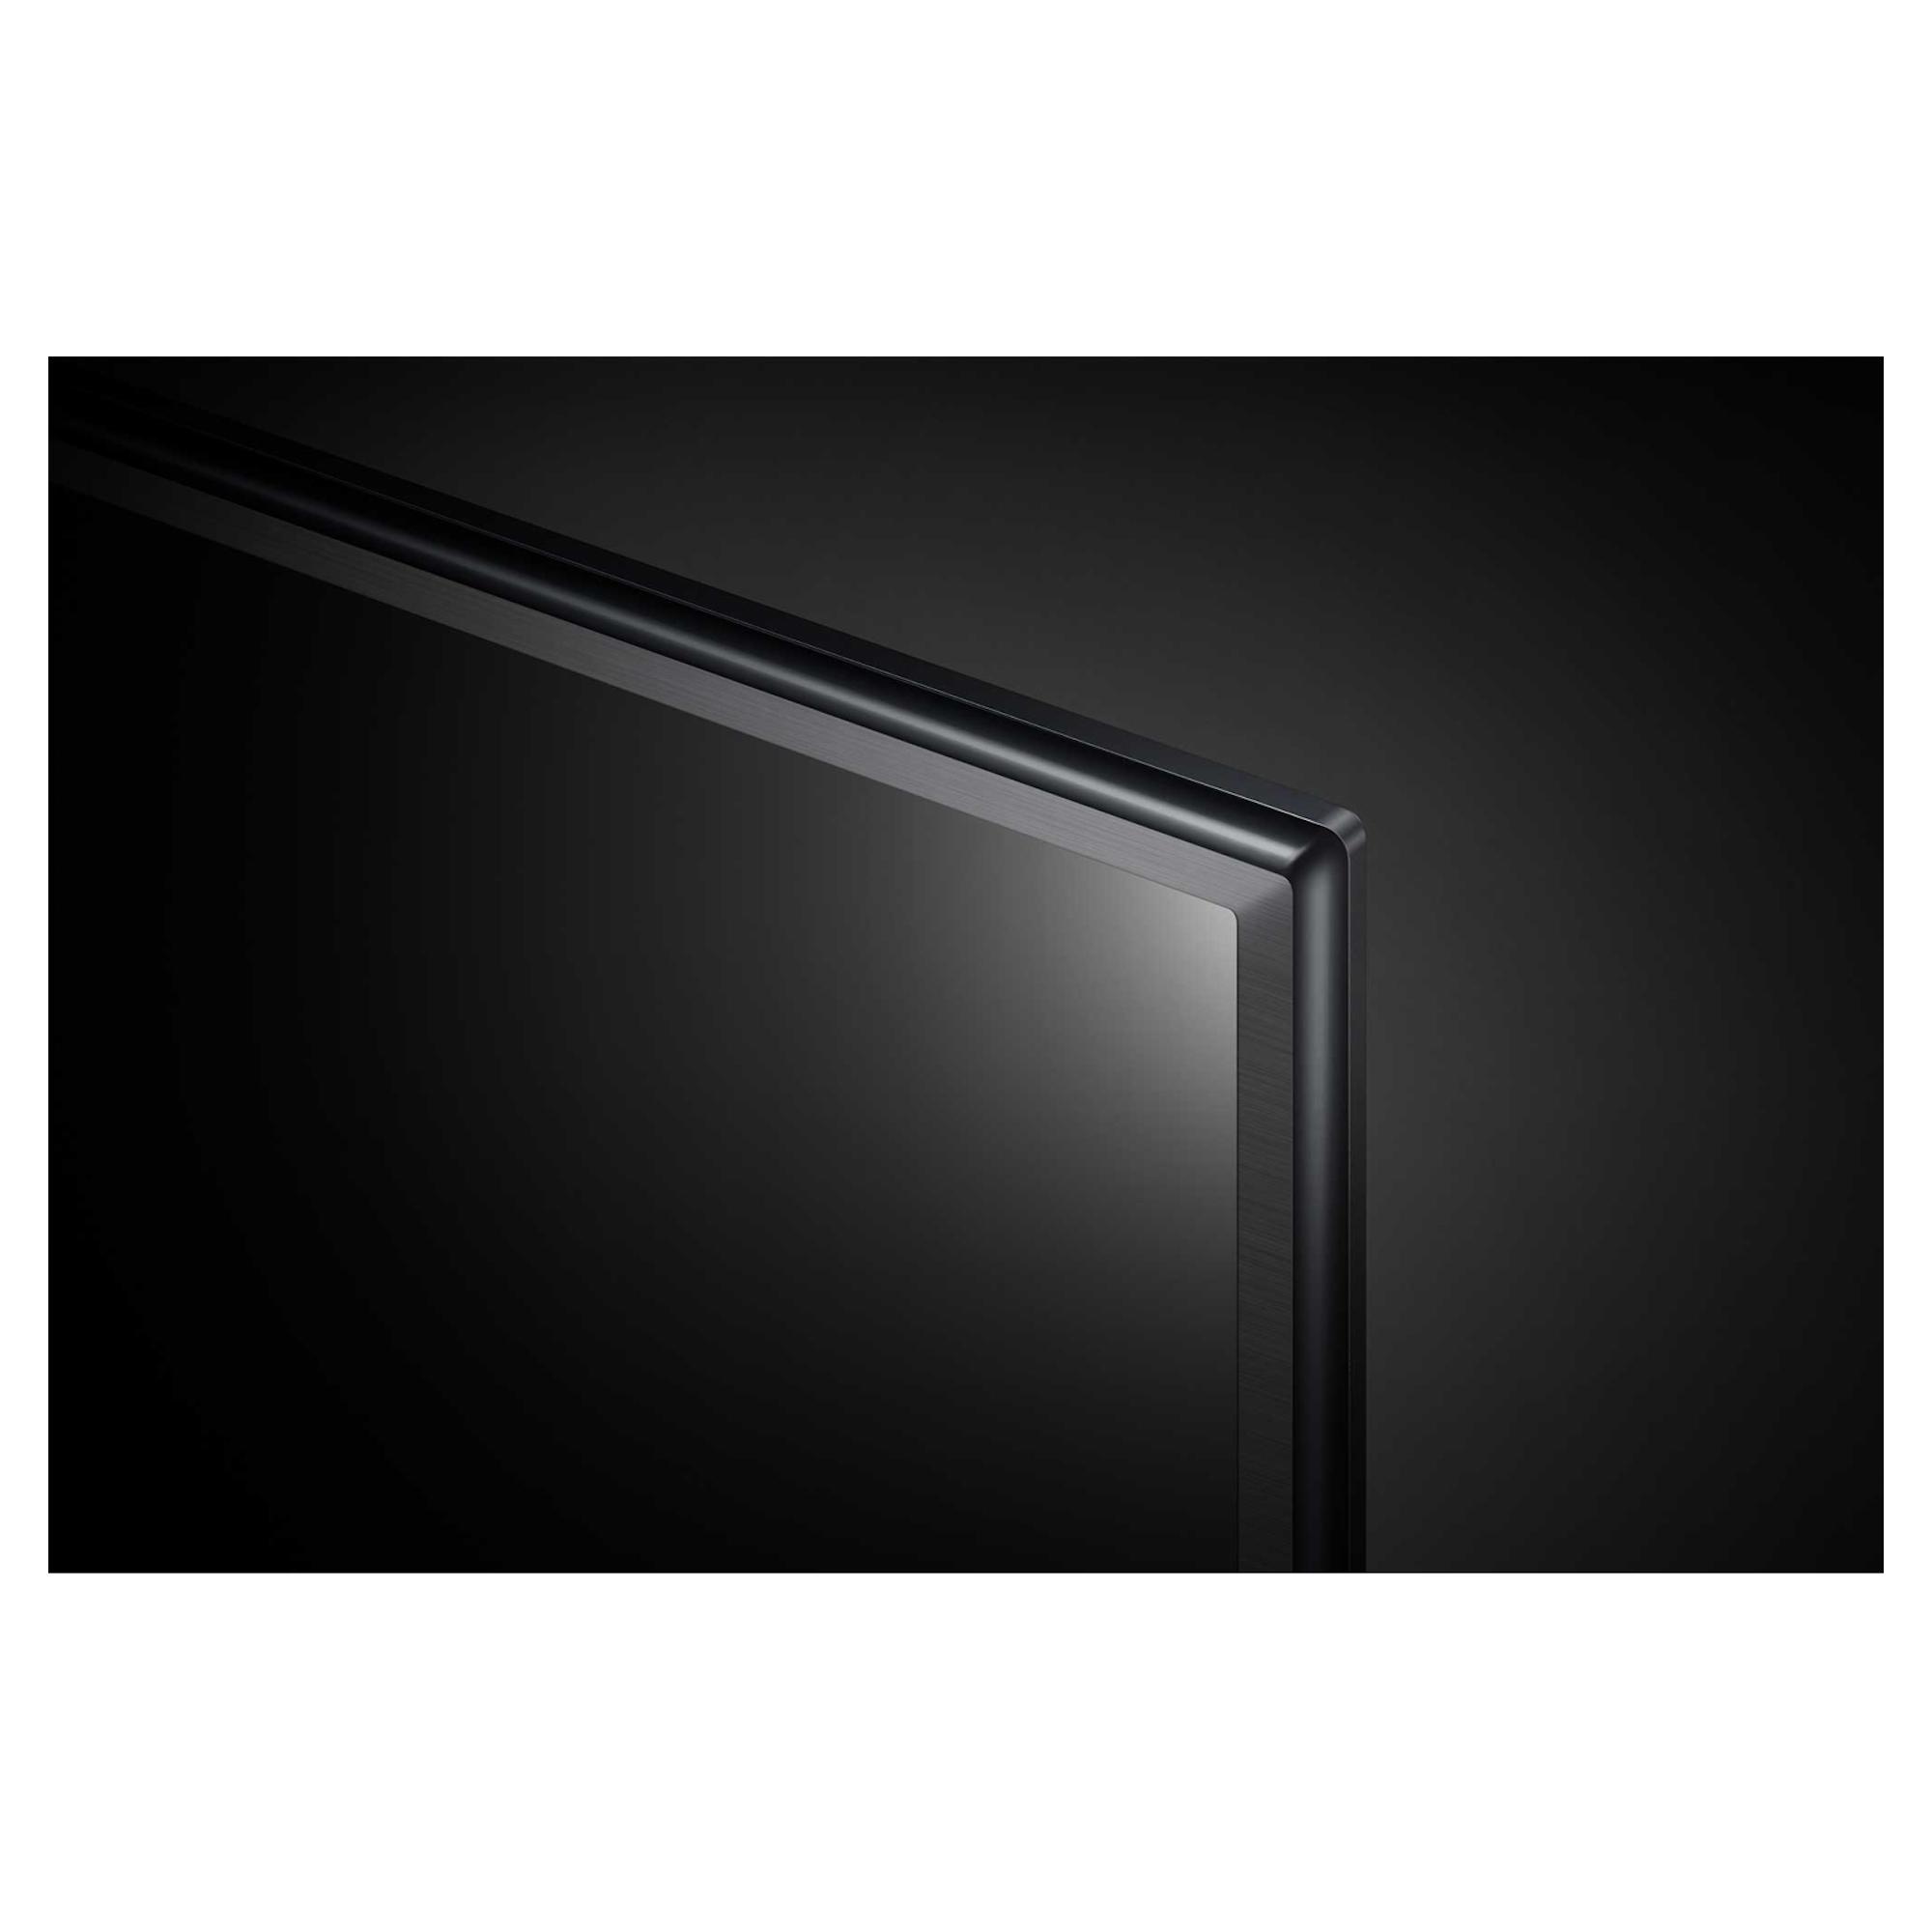 Lg 55 Uk6300 Plb 55 4 K Ultra Hd Smart Hdr Led Tv by Ebay Seller